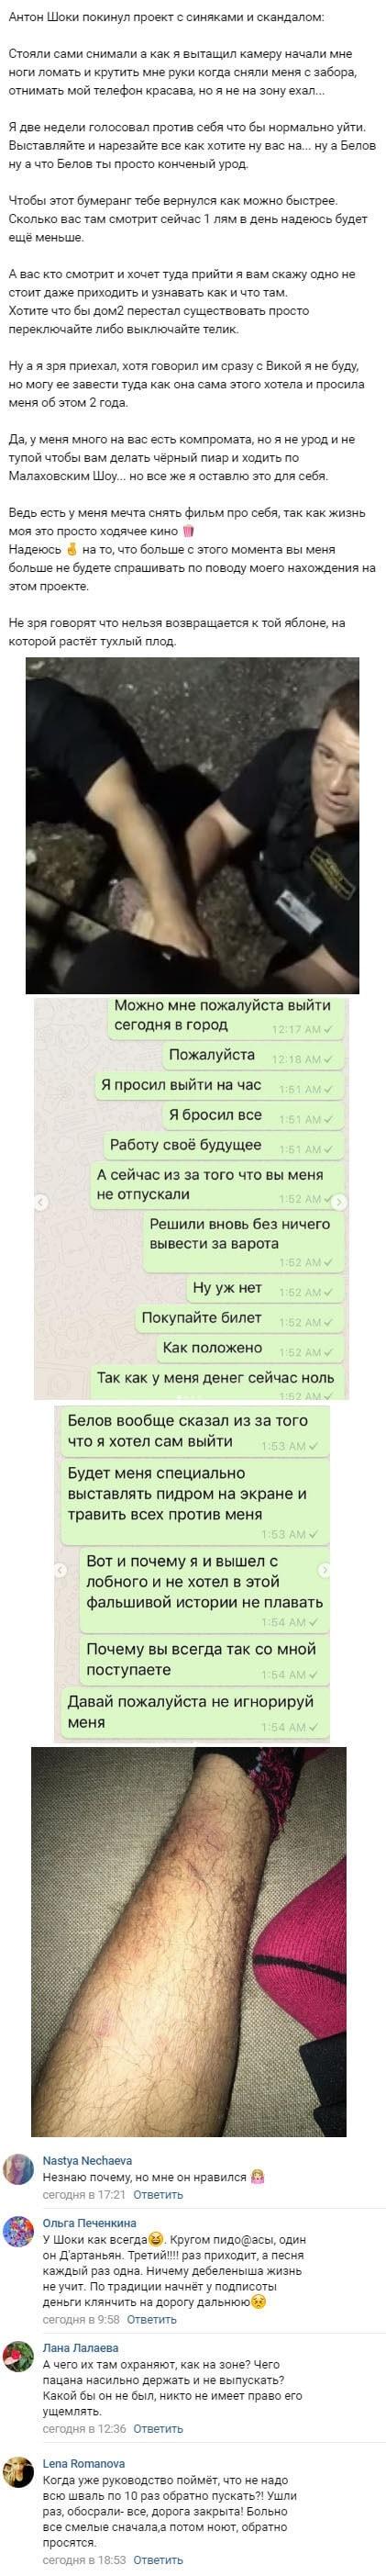 Антон Шоки со скандалом и дракой покинул проект